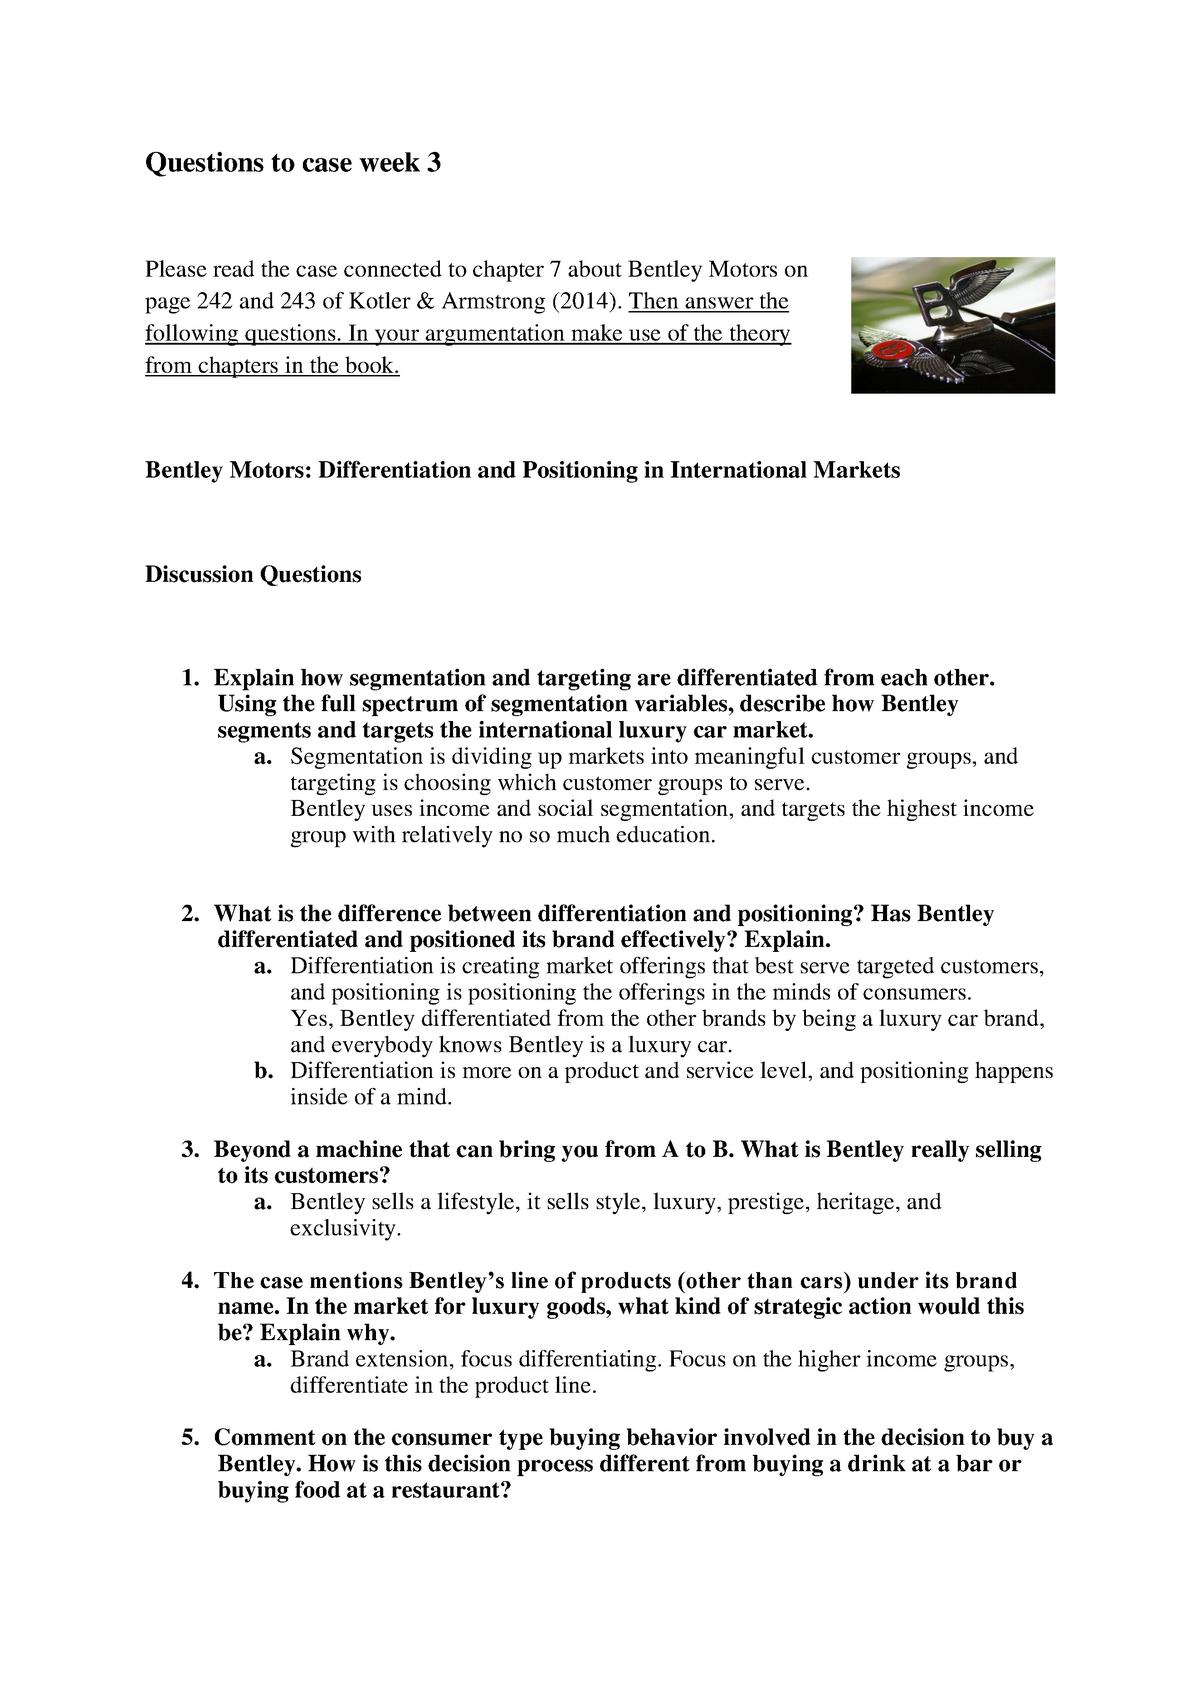 Workgroup elaborations 1-2, elaborations Bentley Motors